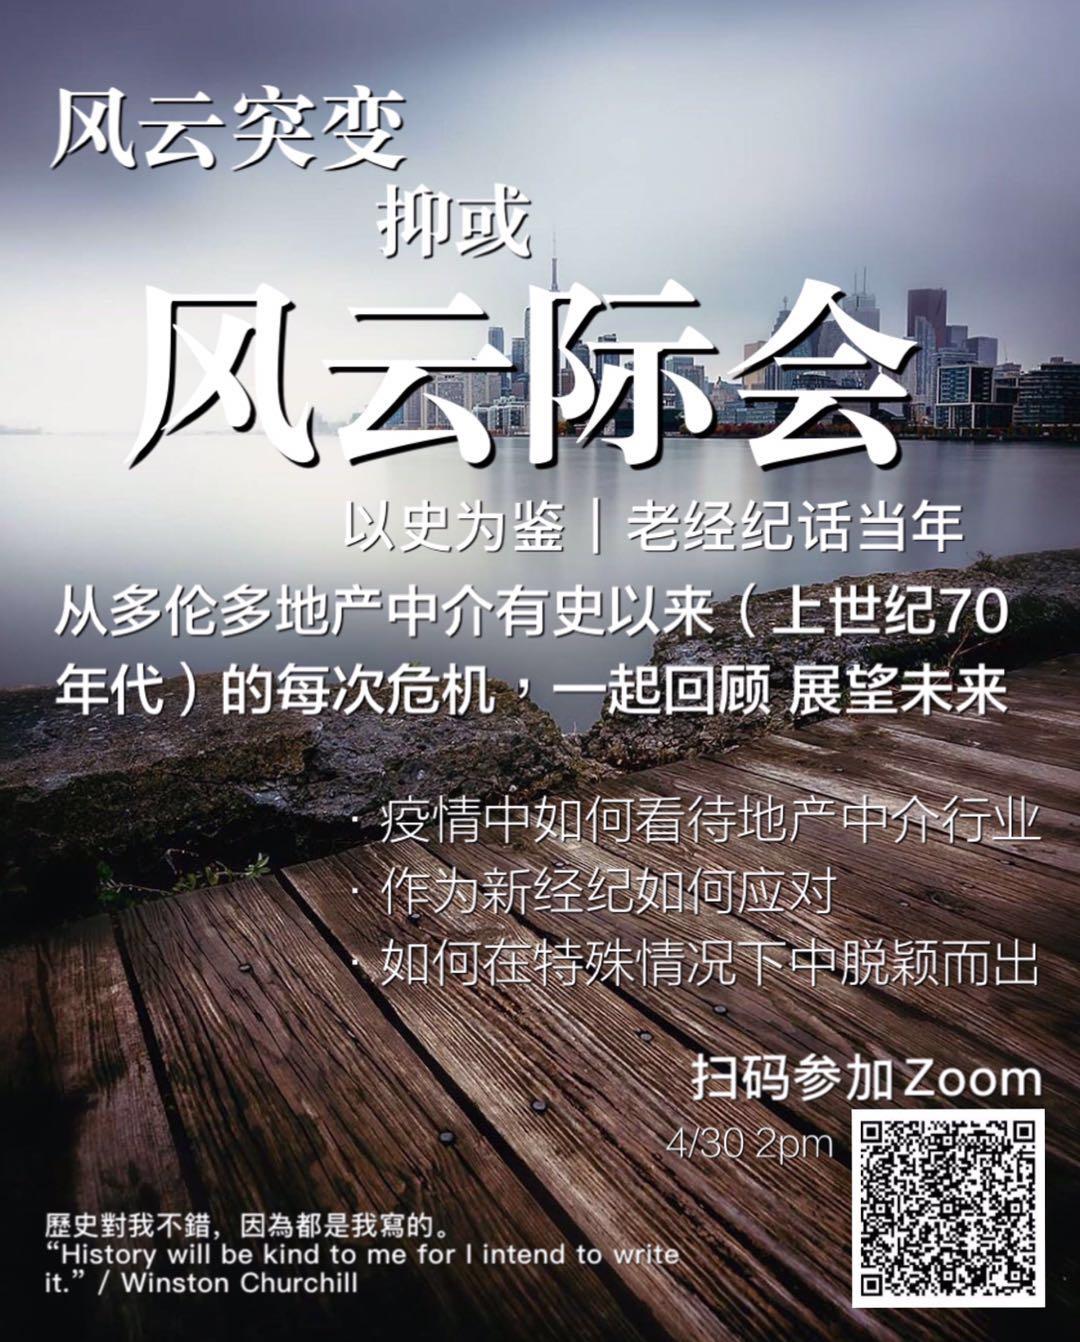 WeChat Image 20200424132854